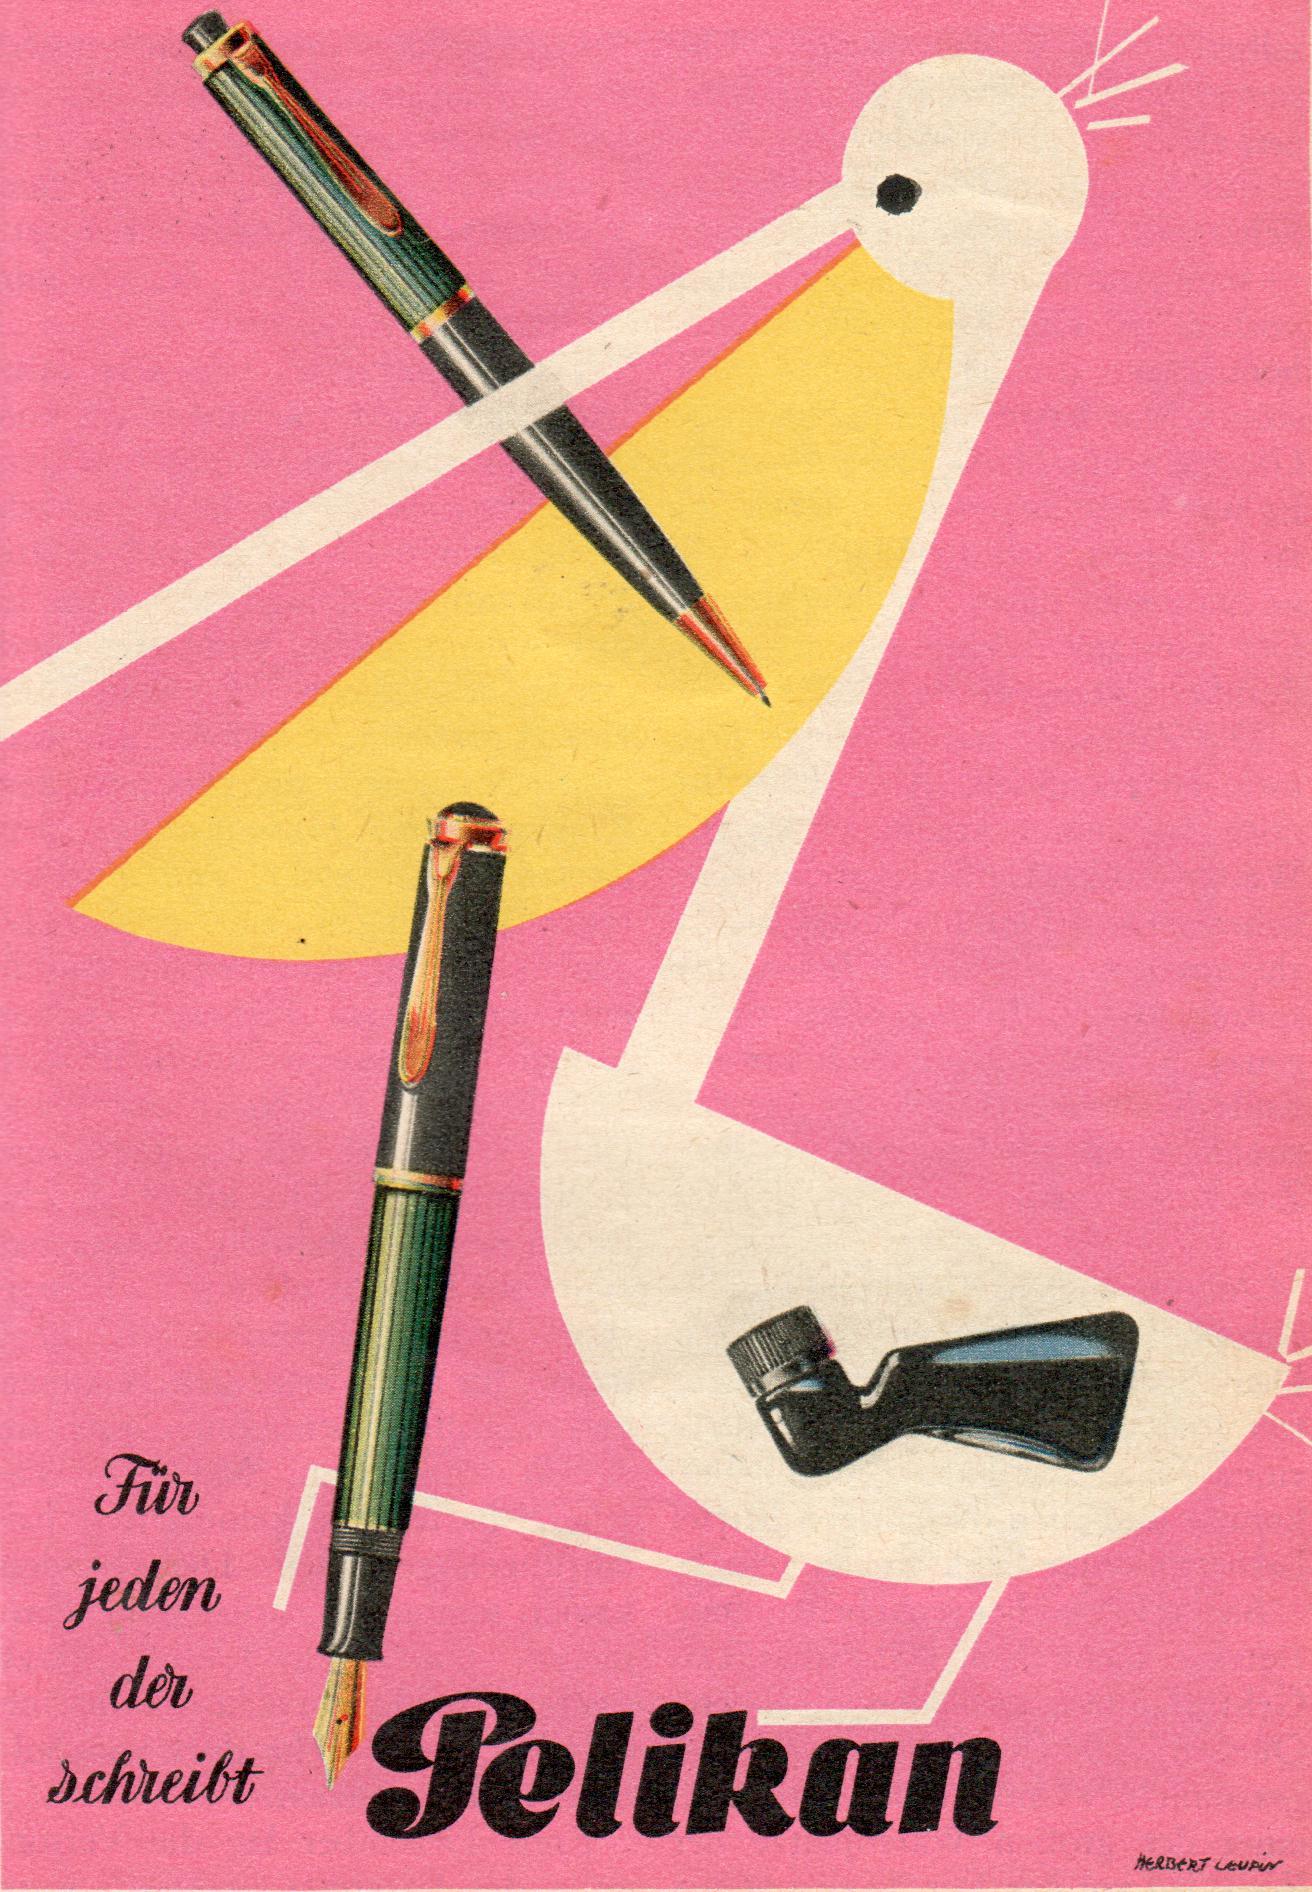 Pelikan Reklame von 1952